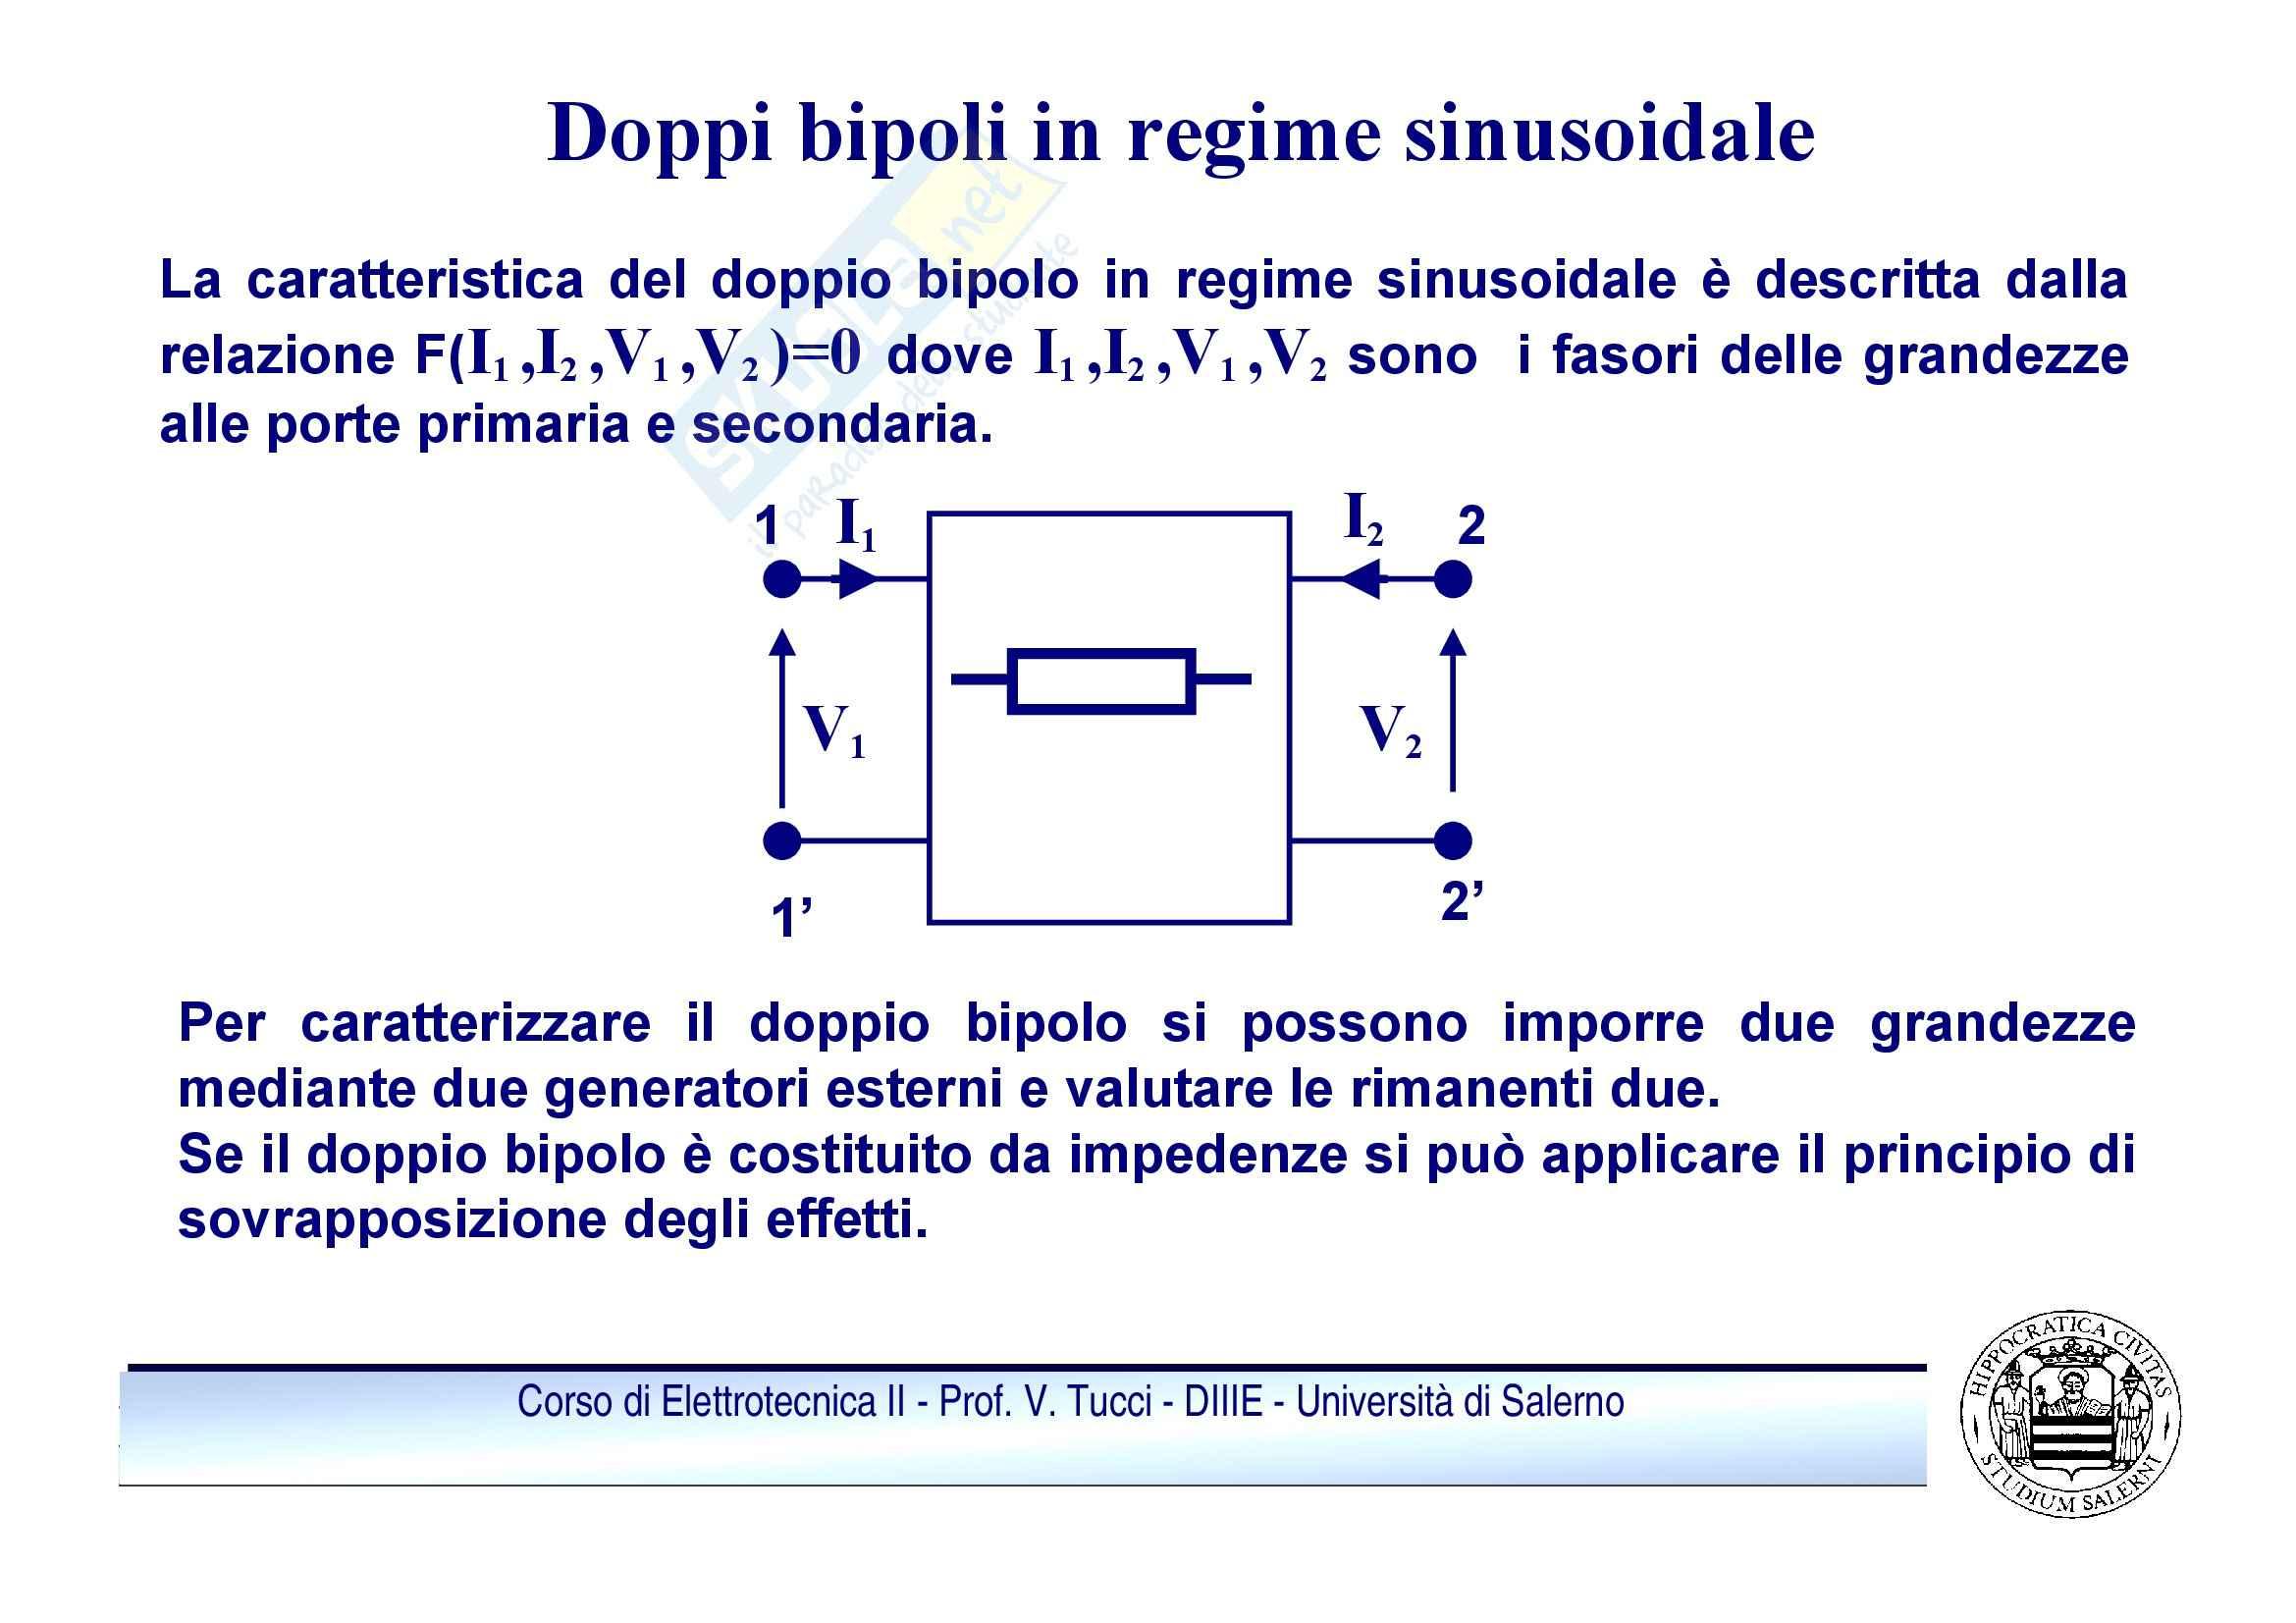 Doppi bipoli - regime sinusoidale